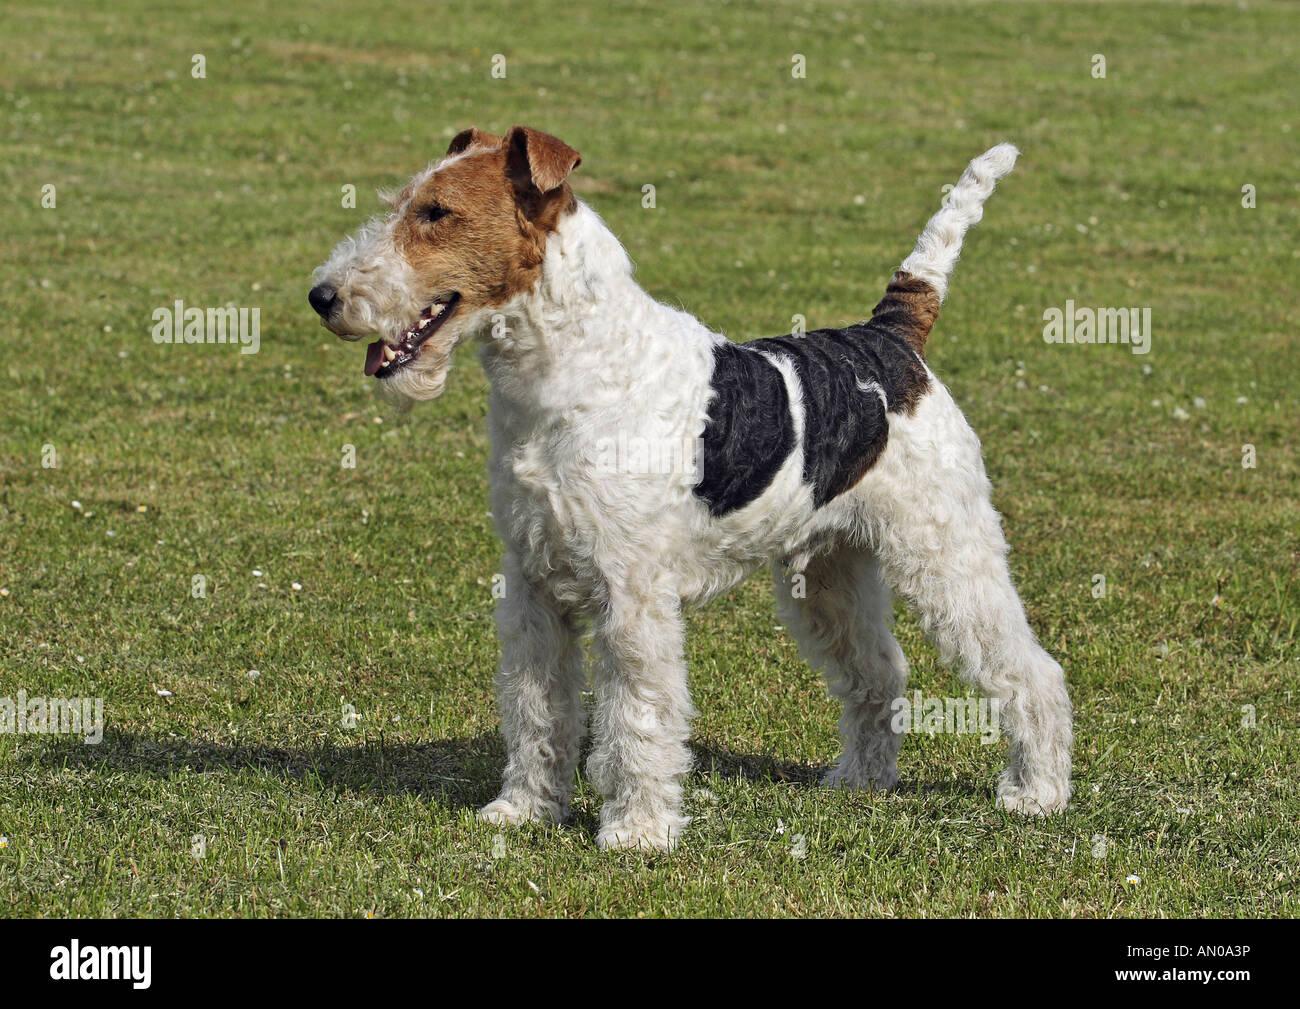 Pedigree Fox Terrier Stockfotos & Pedigree Fox Terrier Bilder ...